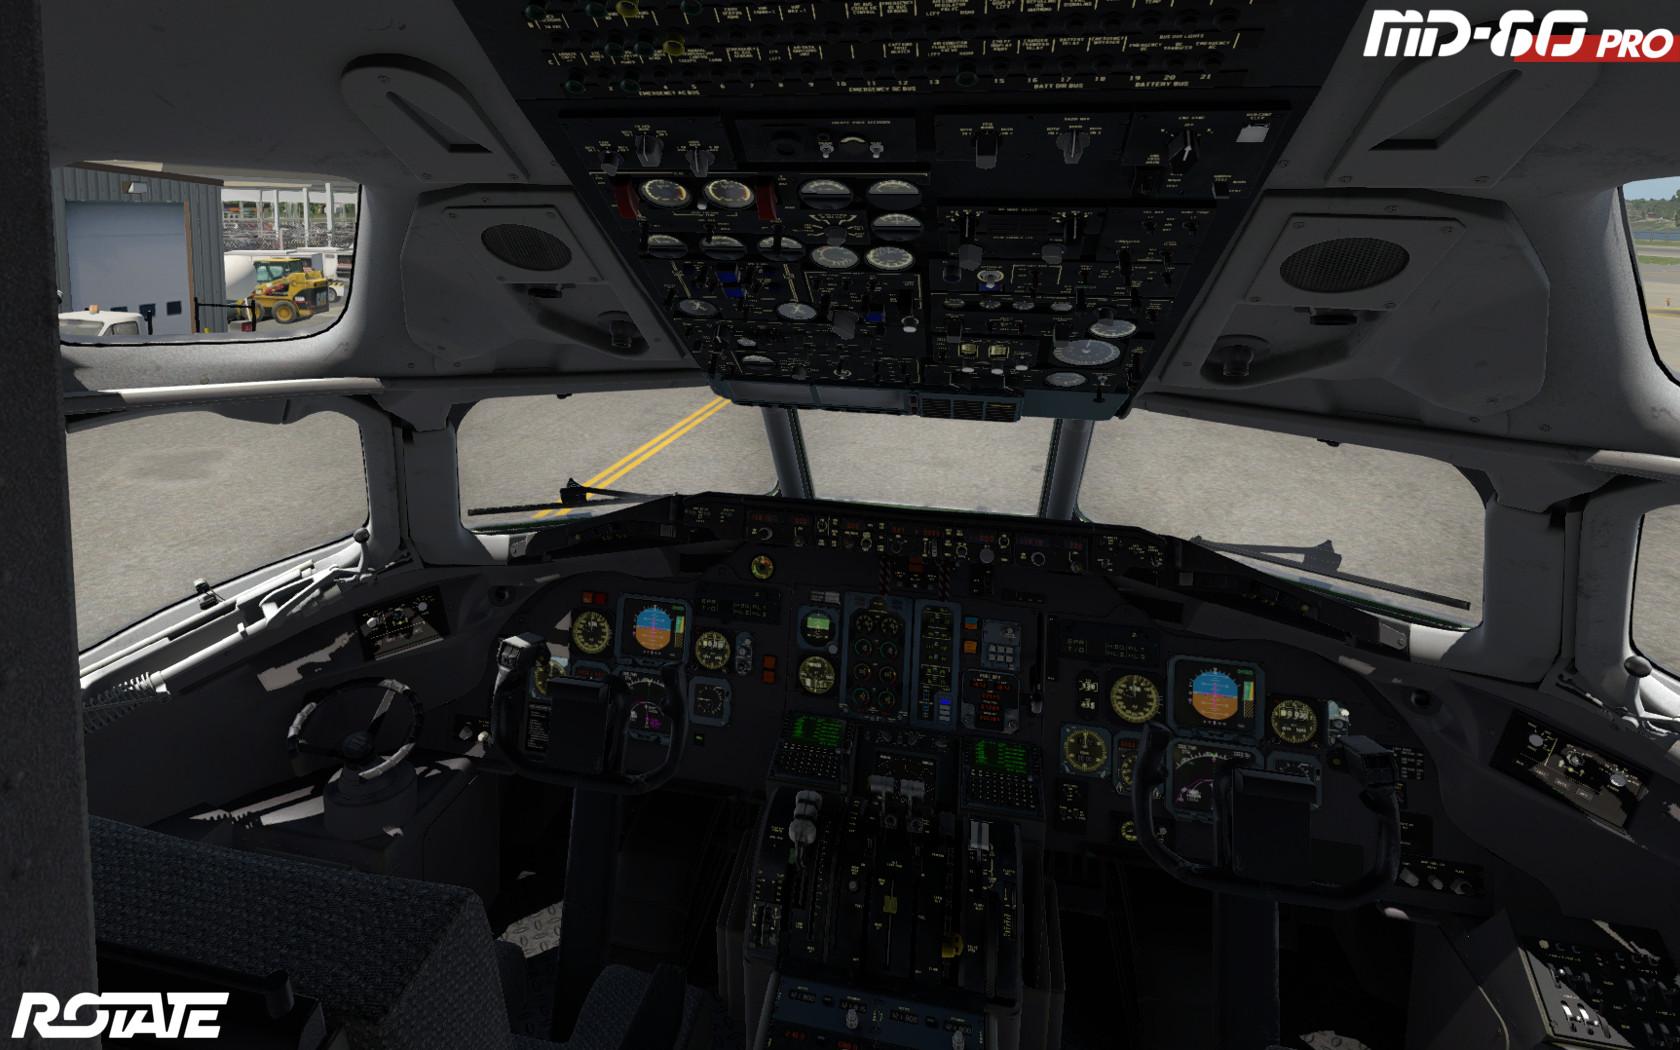 Rotate MD-80-v1.41